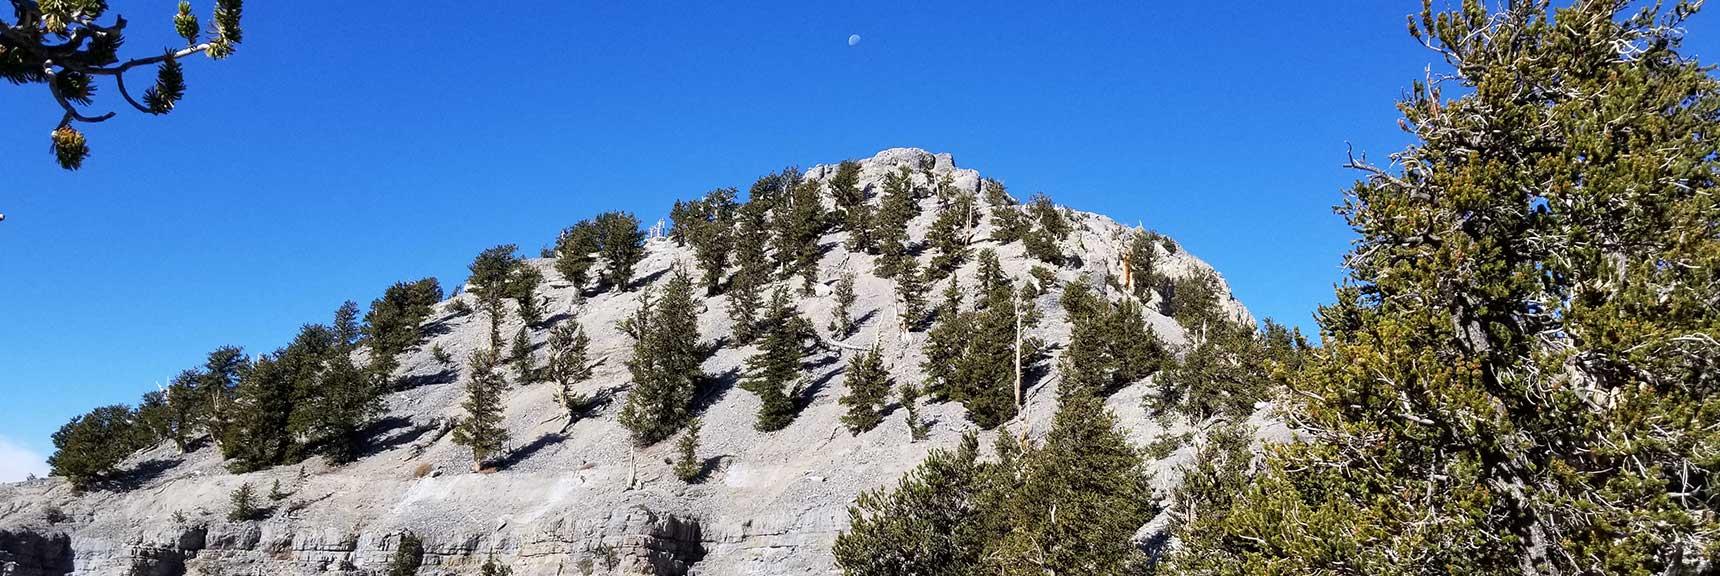 Lee Peak in Kyle Canyon, Spring Mountains, Nevada Slide 001